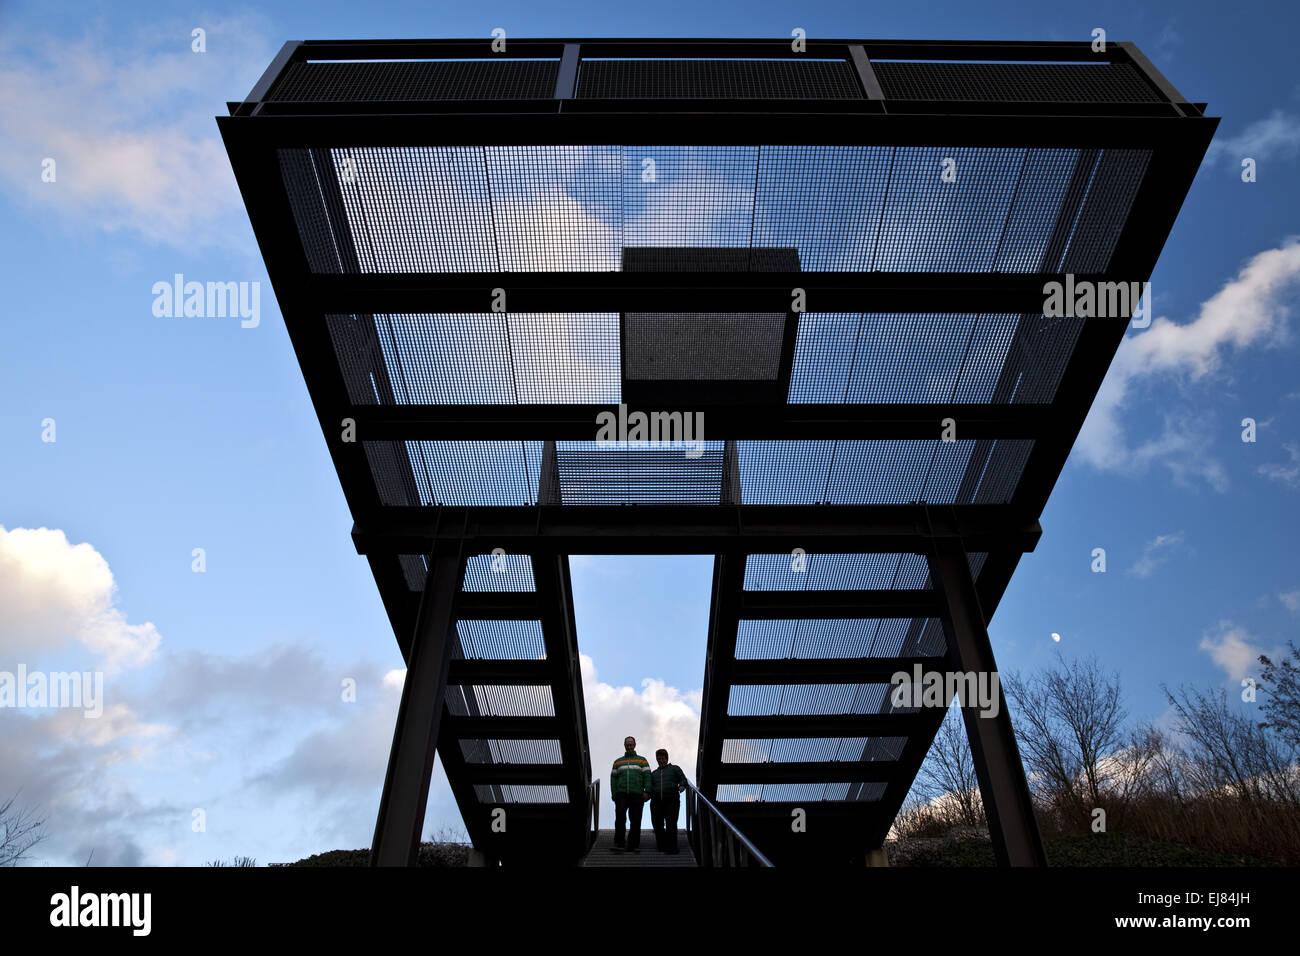 Escaliers Himmelsstiege, Herten, Allemagne Photo Stock